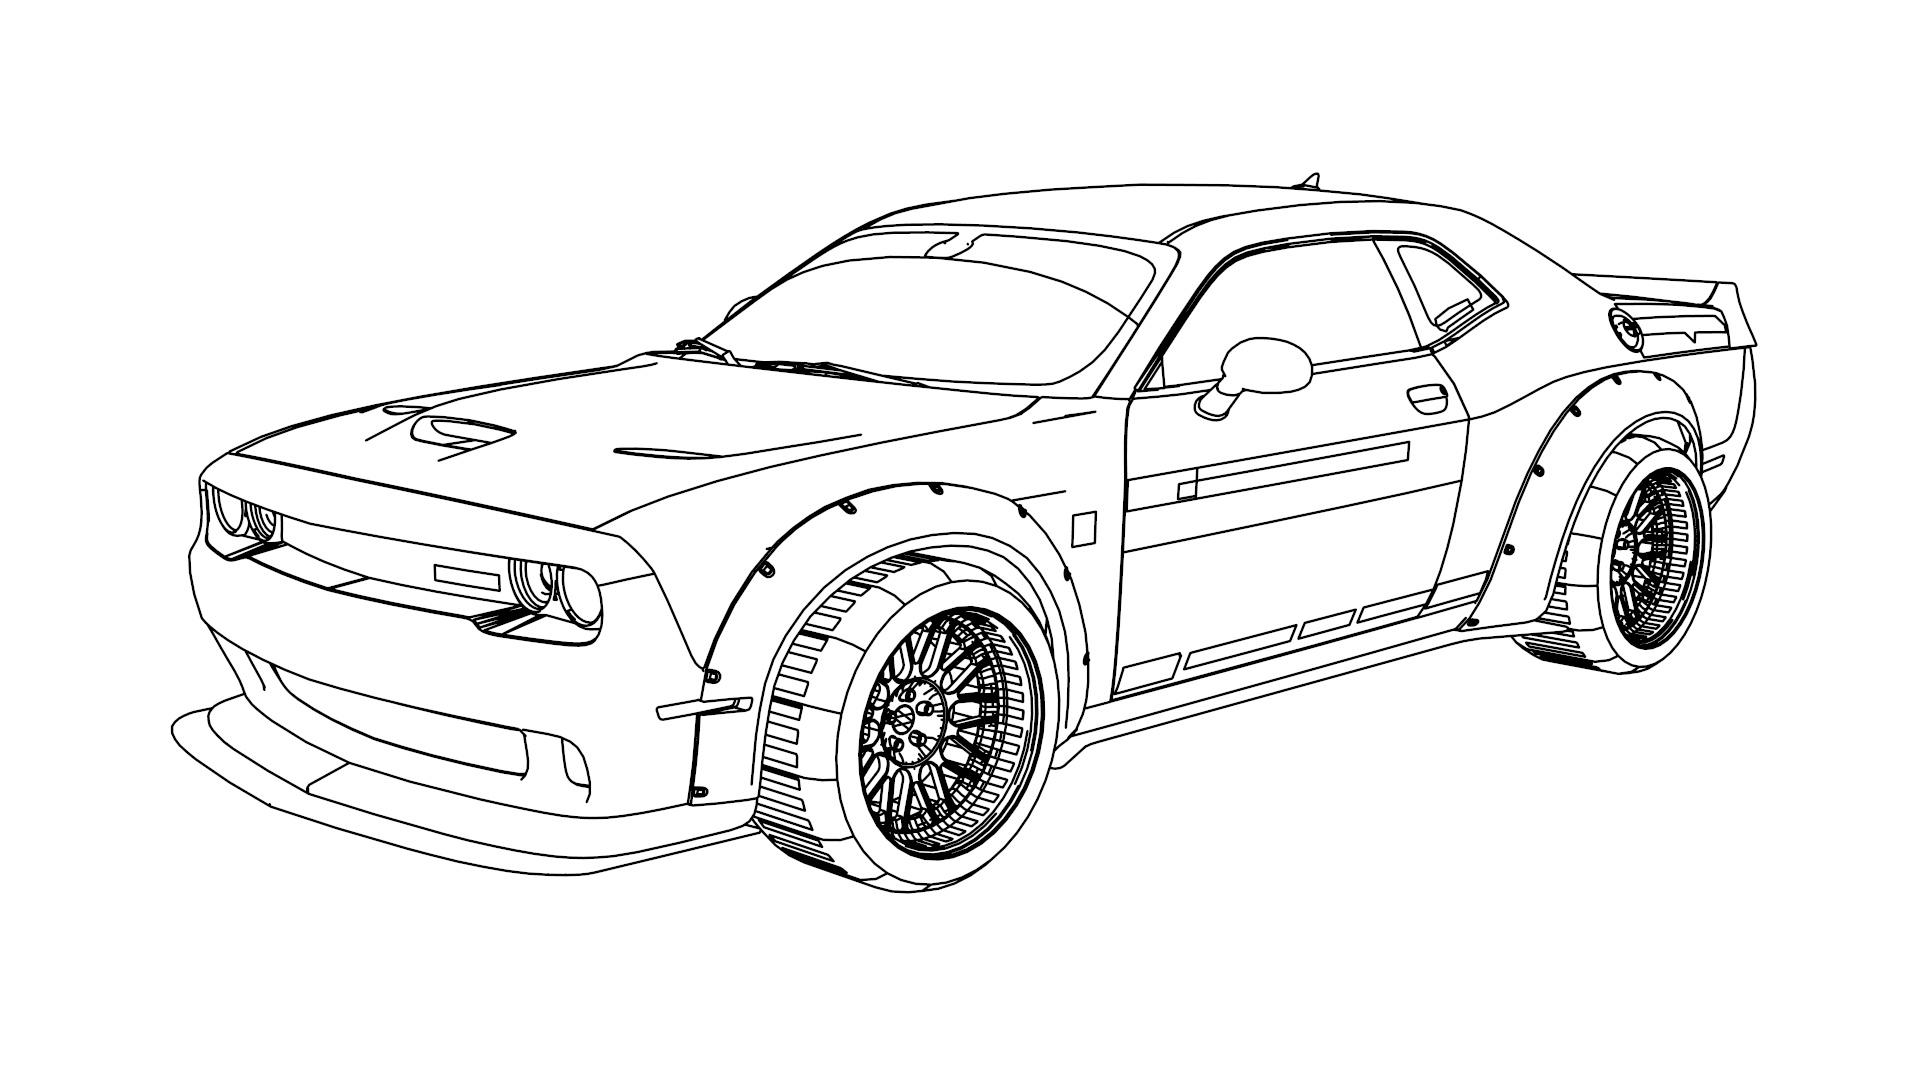 Dodge Challenger SRT Hellcat LBW 2015 Coloring Page